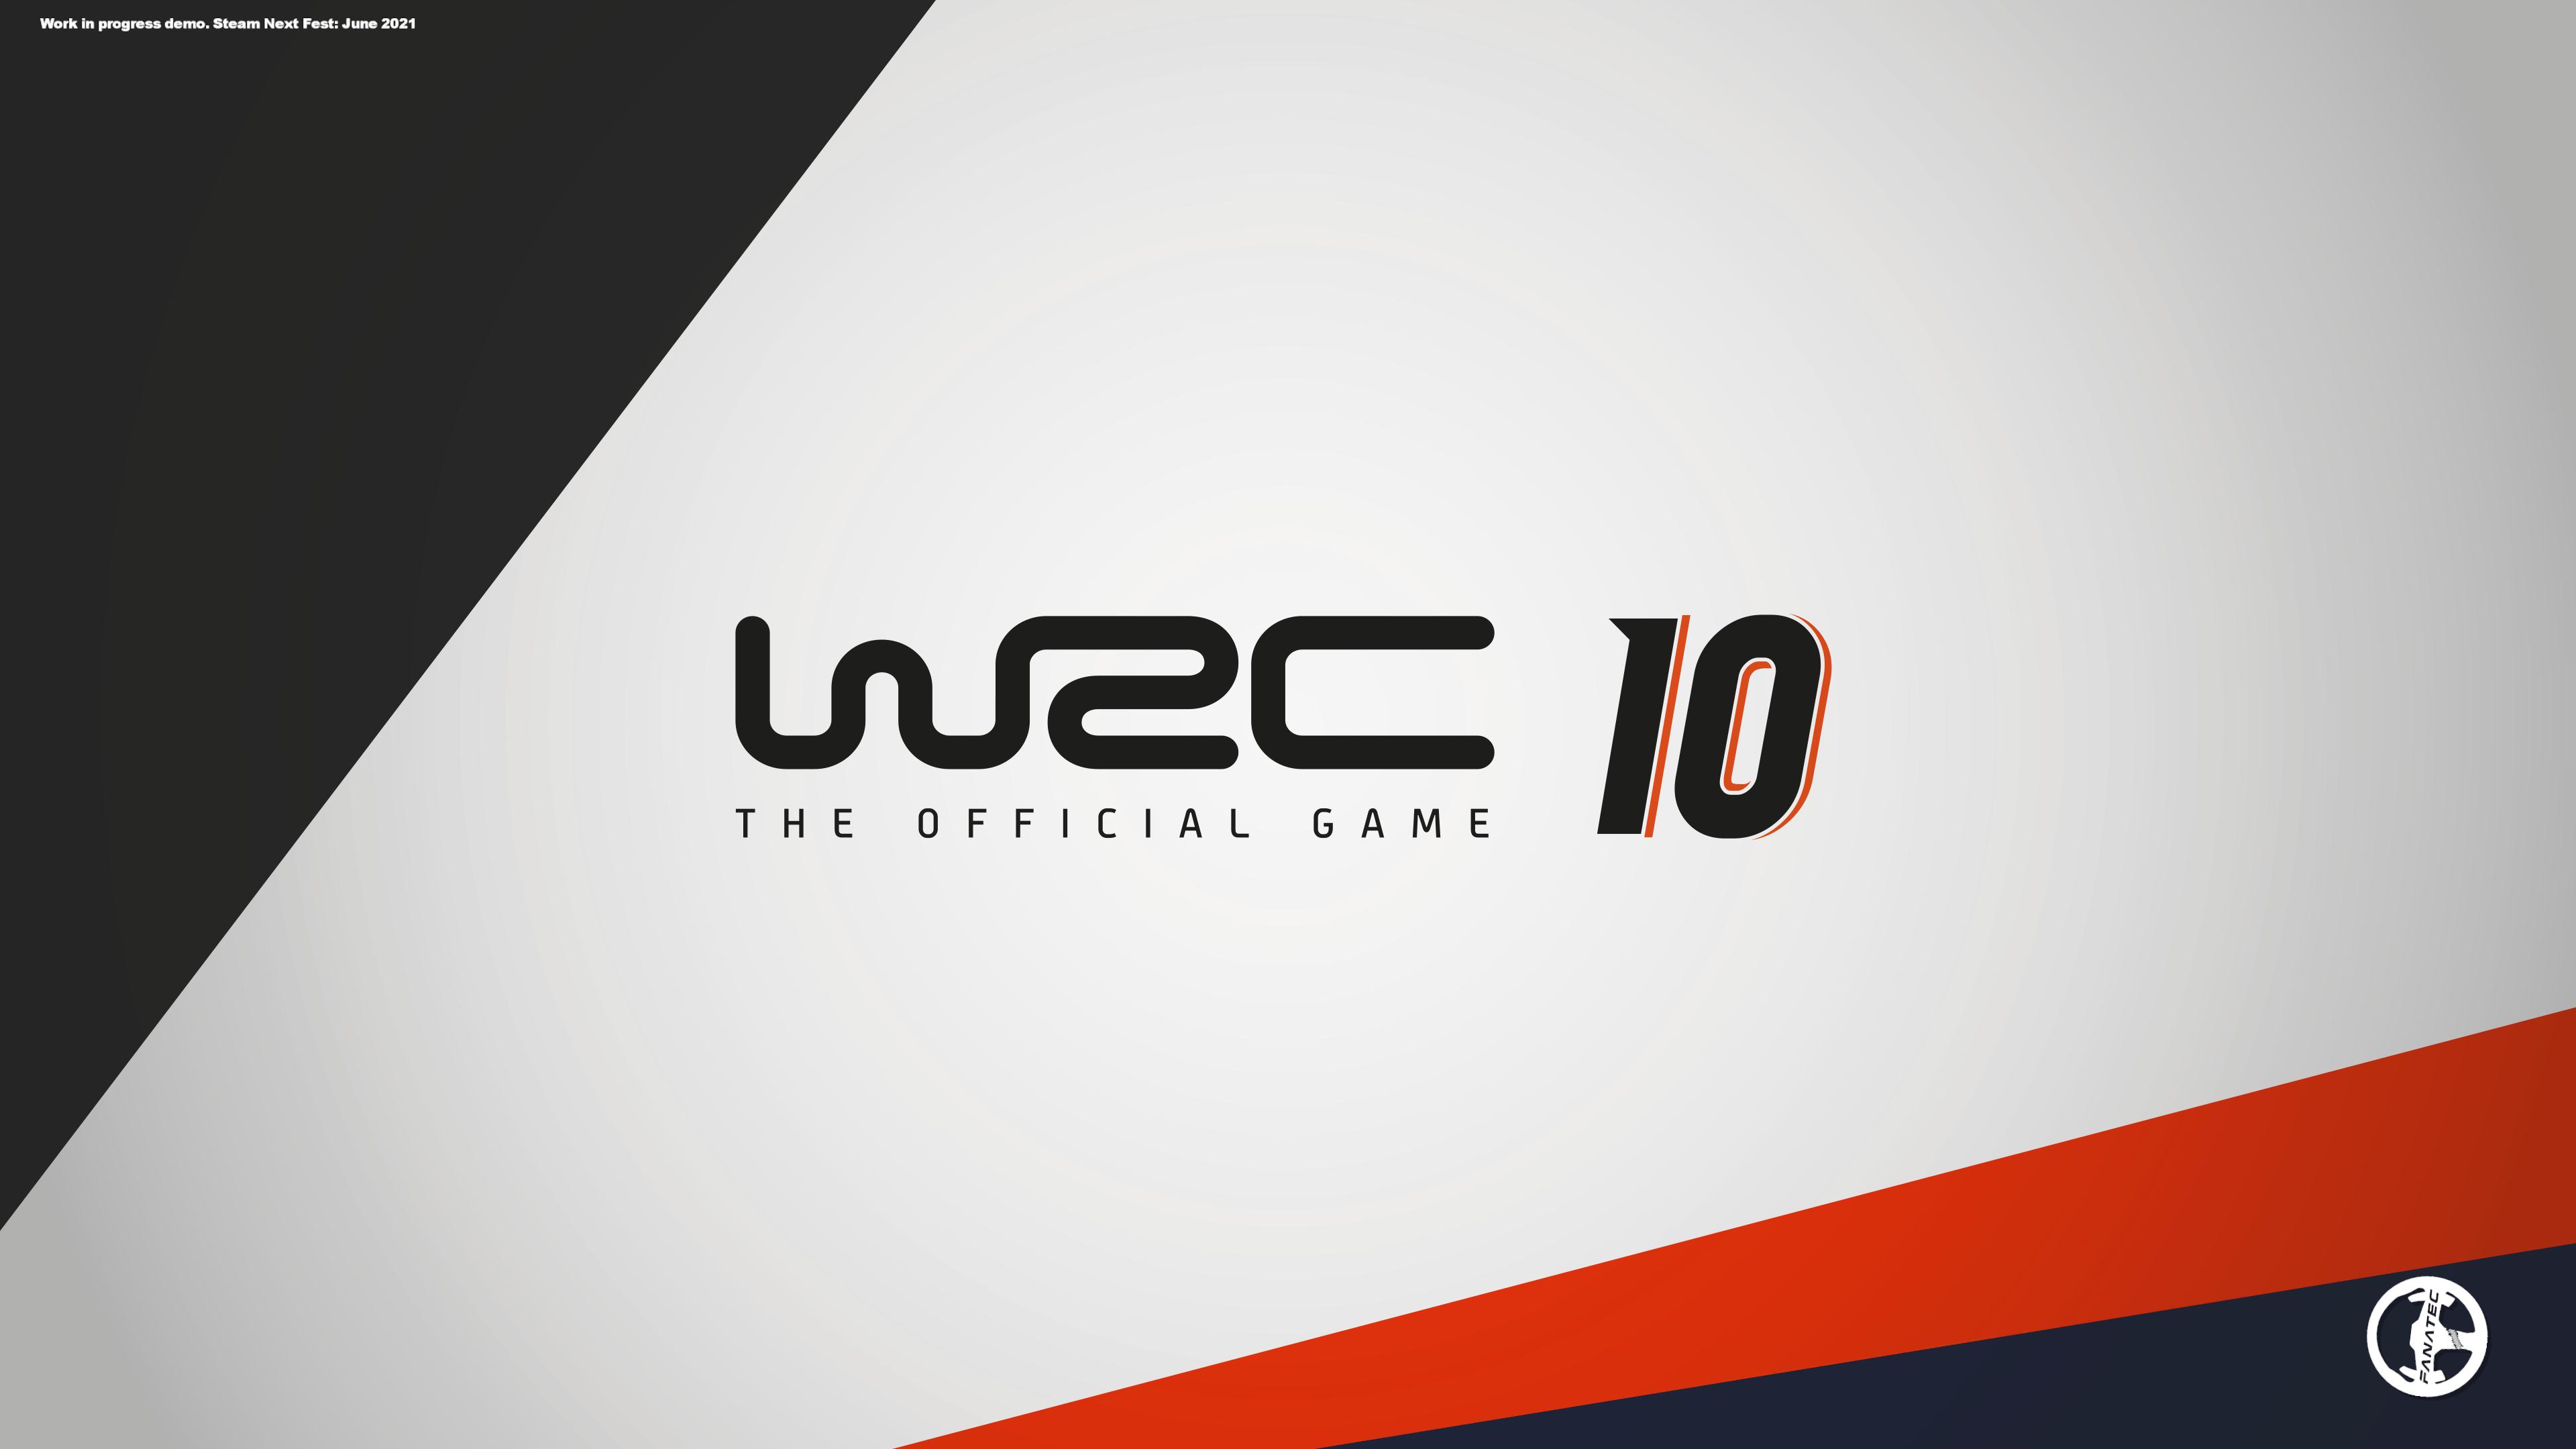 Wrc 10 Fia World Rally Championship Demo Screenshot 2021.06.12 - 13.35.40.96